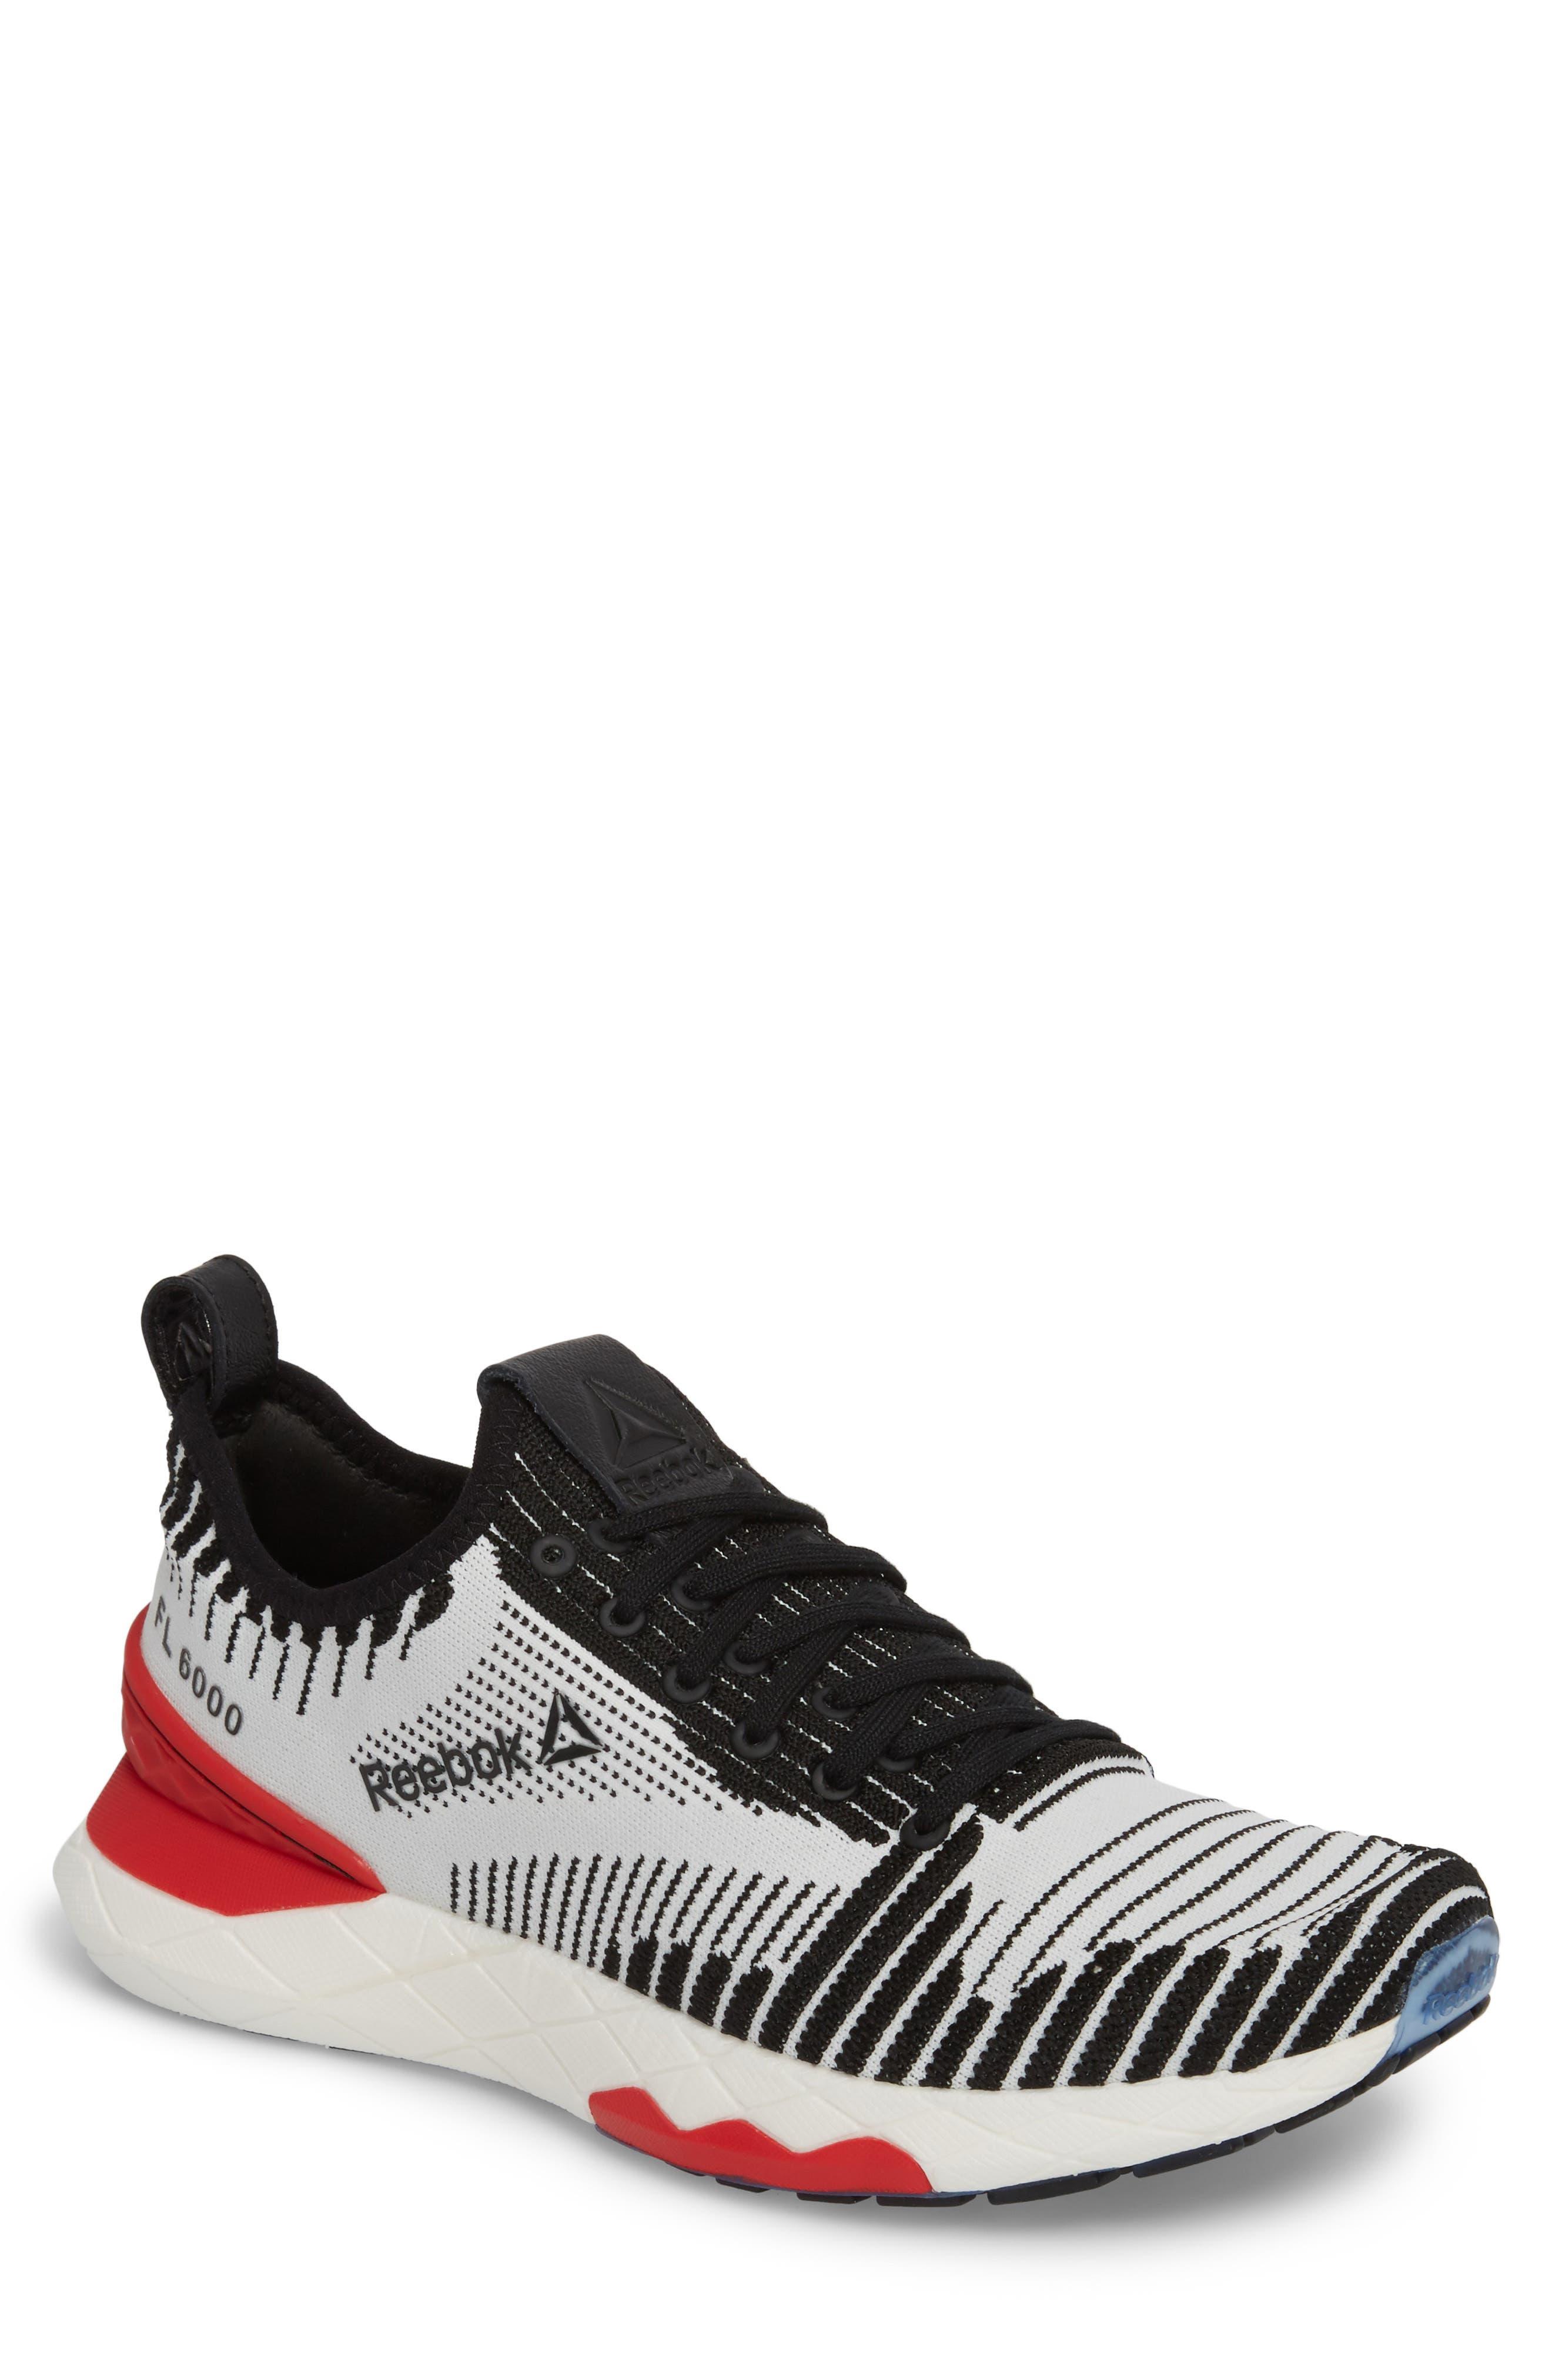 Floatride Run 6000 Running Shoe,                             Main thumbnail 1, color,                             001